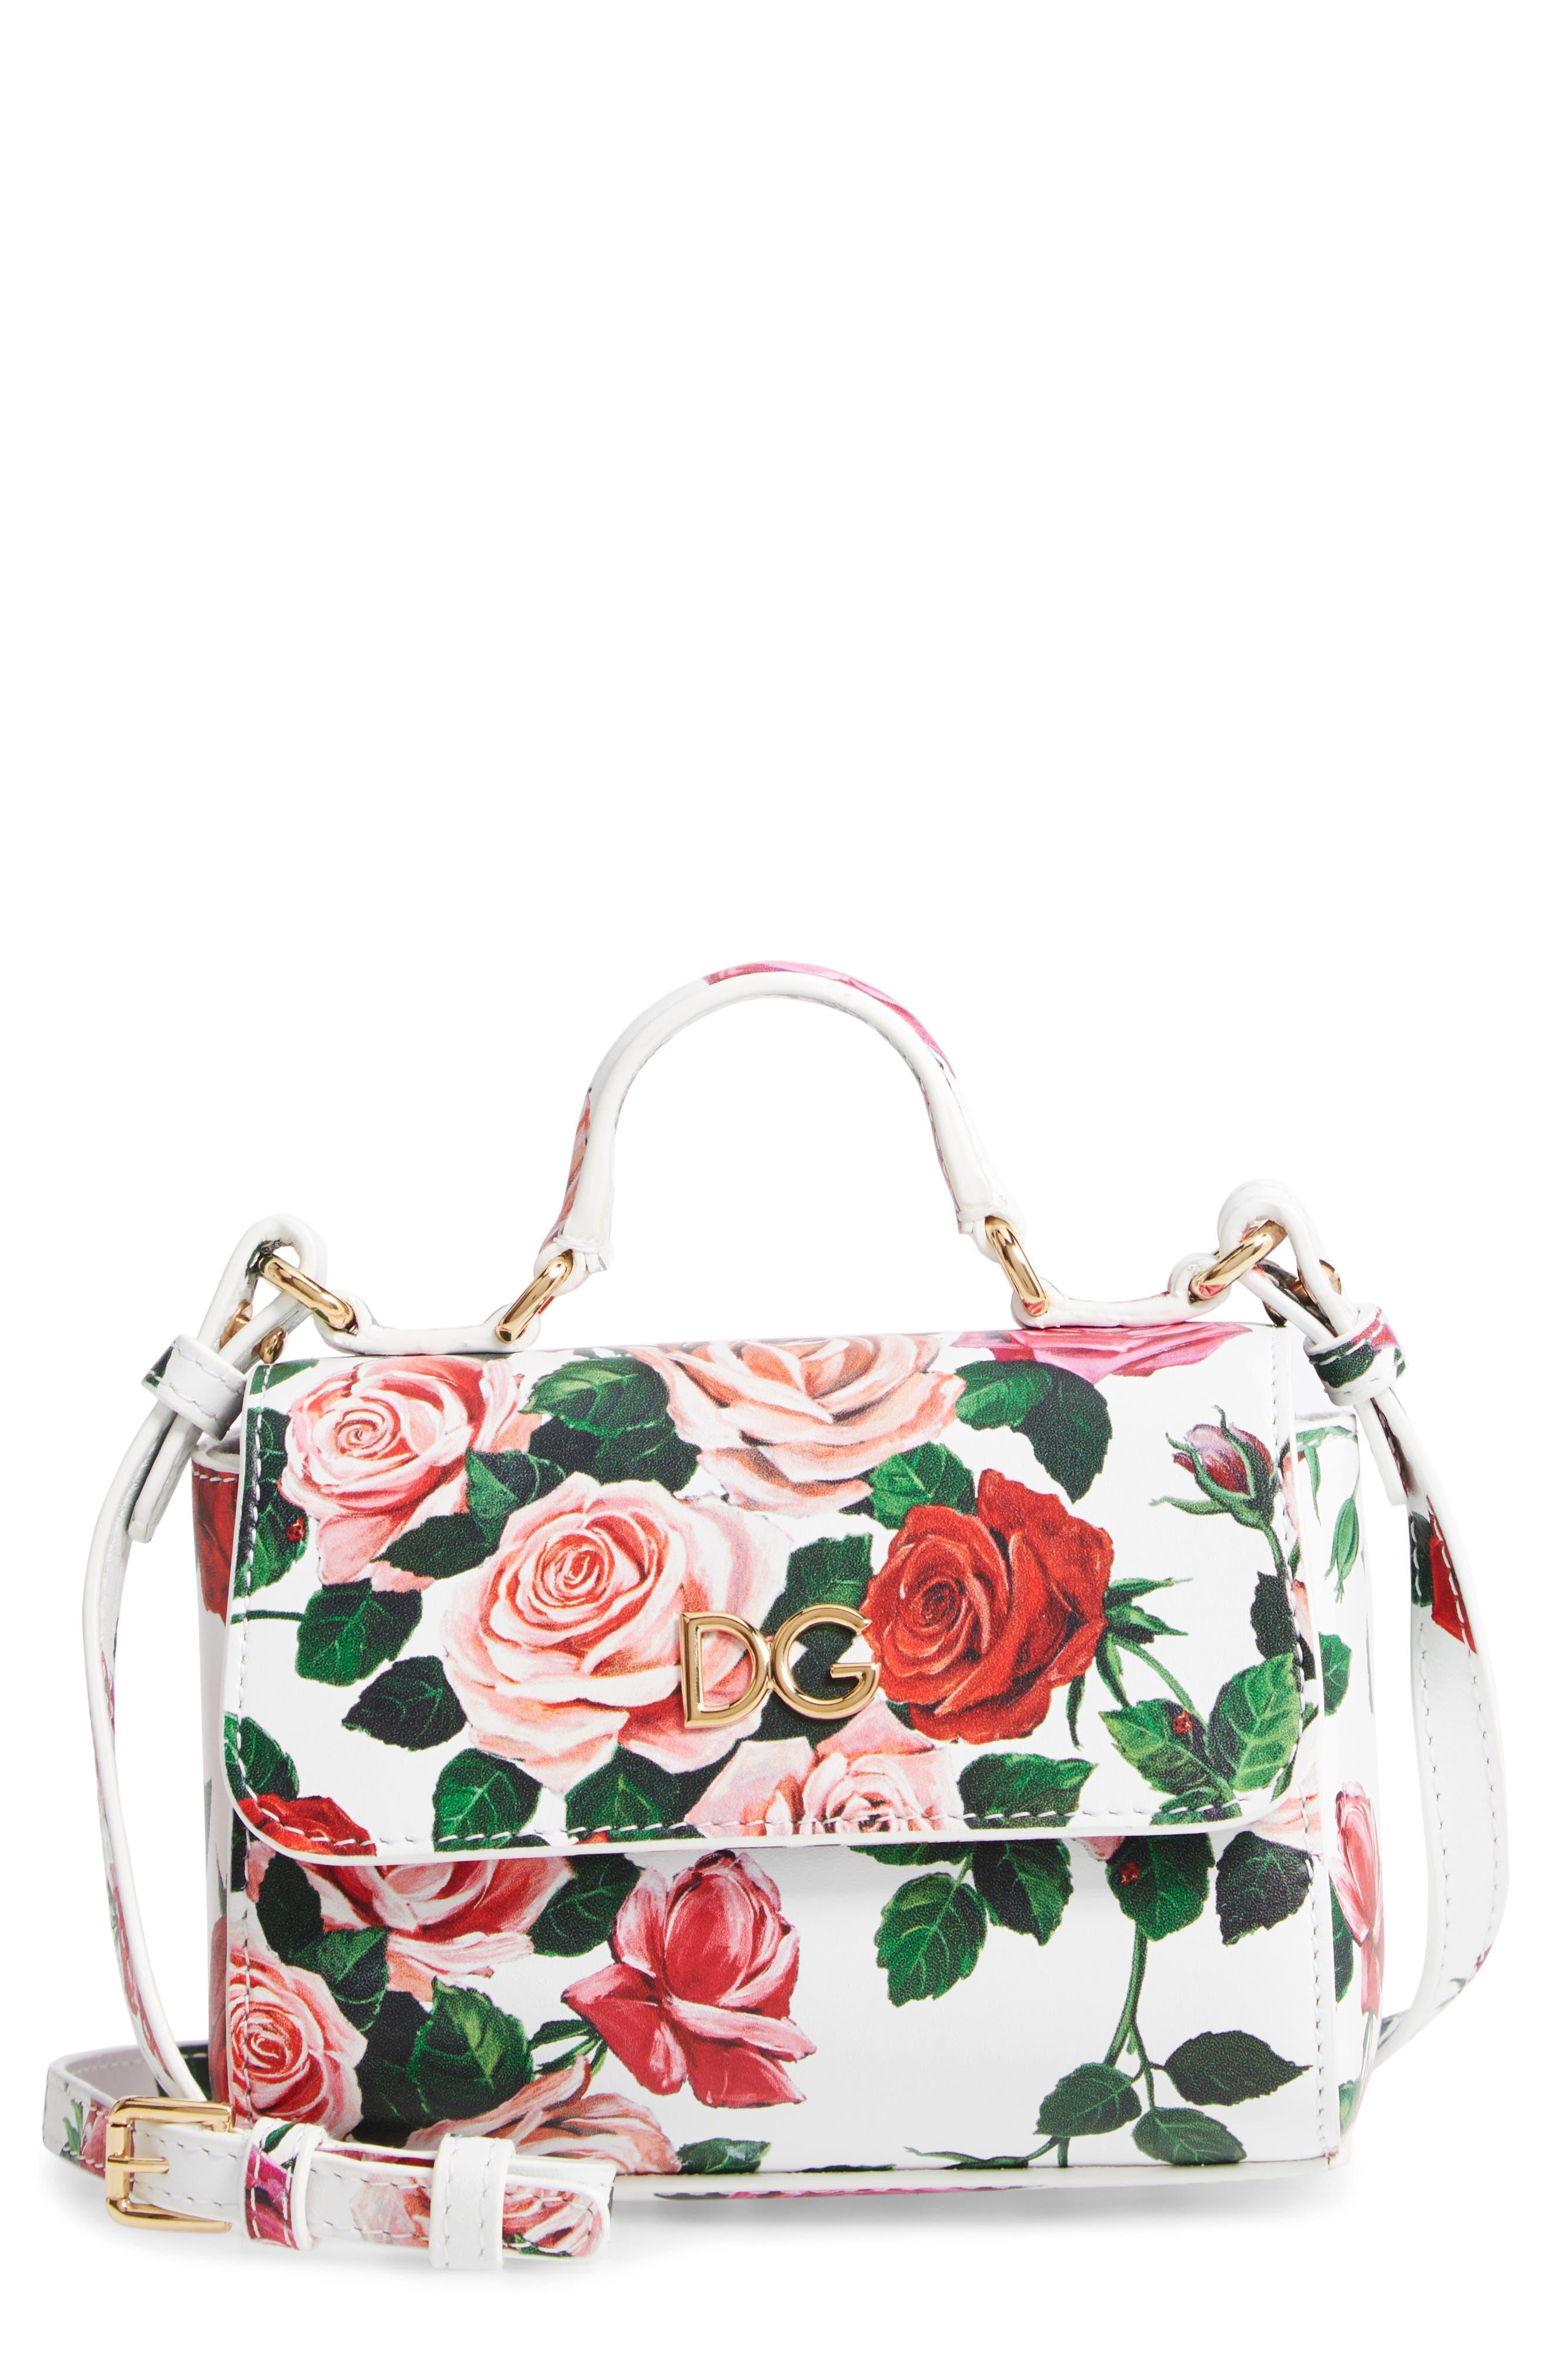 DOLCE&GABBANA Floral Print Handbag, Main, color, MIX ROSE FDO BCO NAT